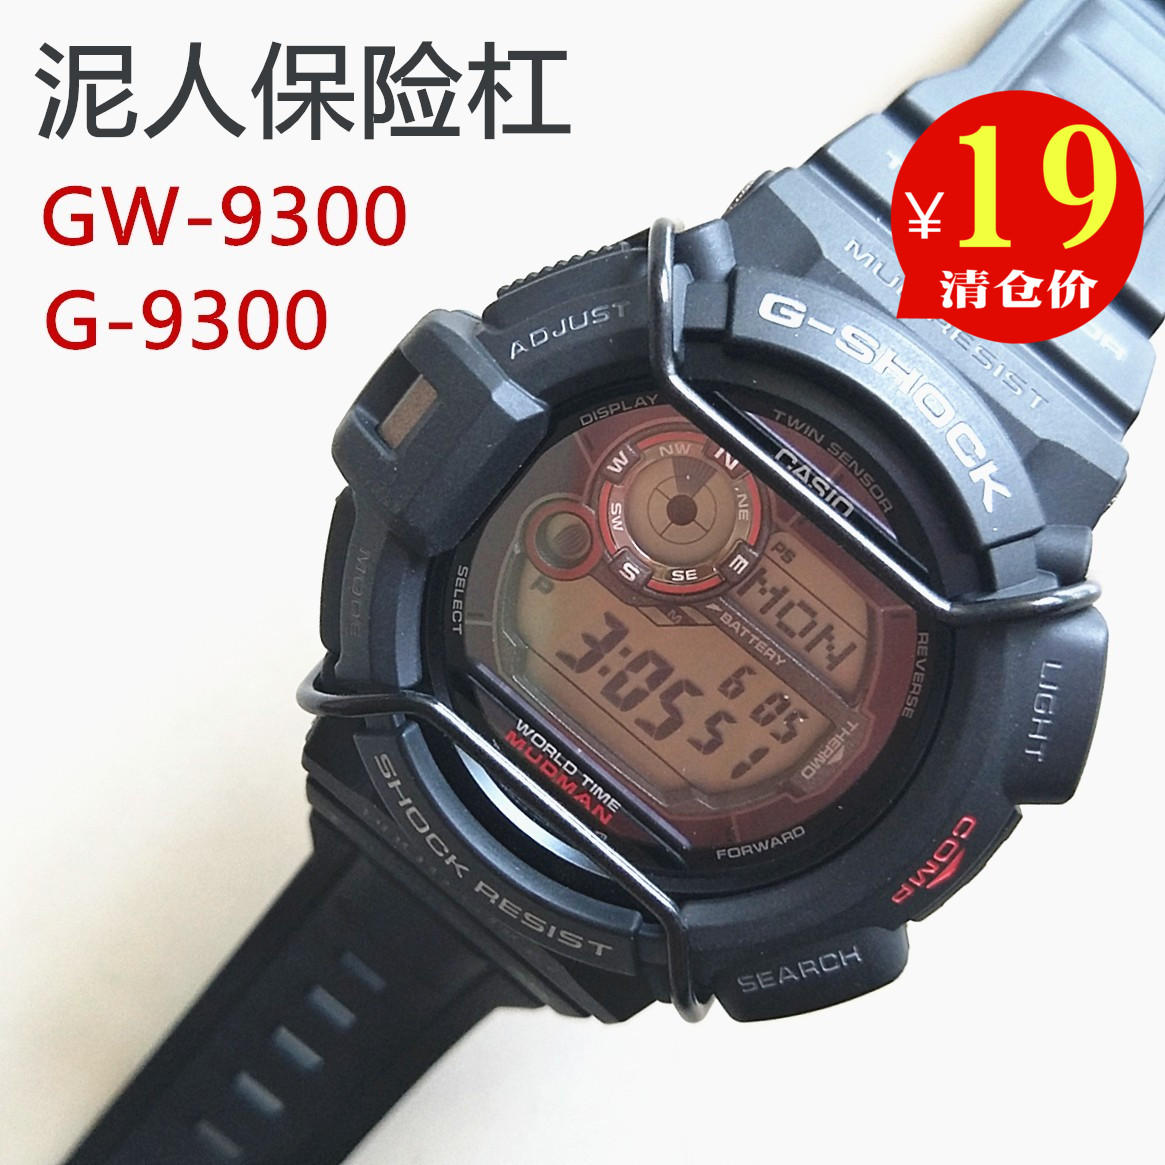 casio卡西欧手表配件G-SHOCK保险杠GW-9300 G-9300泥人手表保护杠